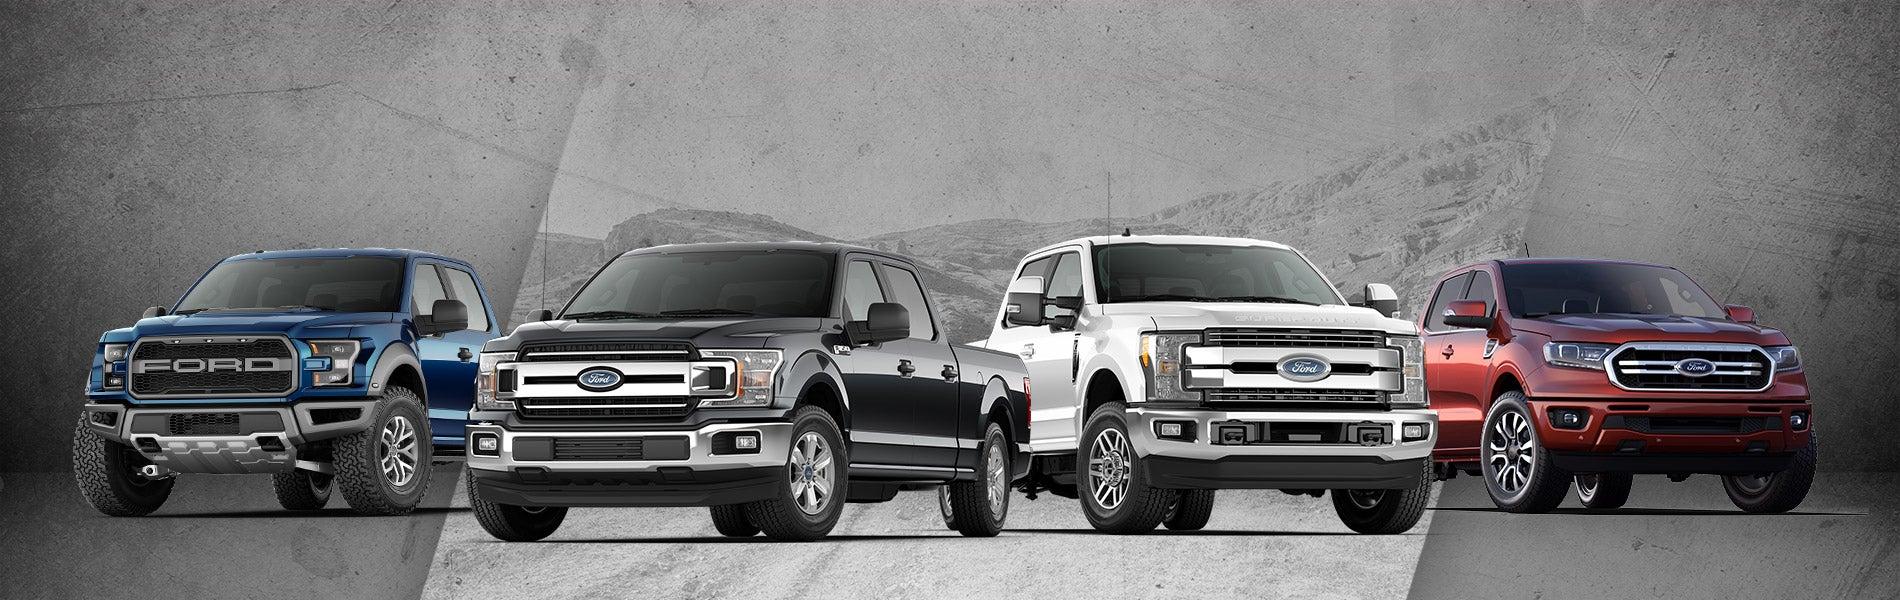 Ford Charleston Sc >> Ford Trucks Lineup Charleston Sc